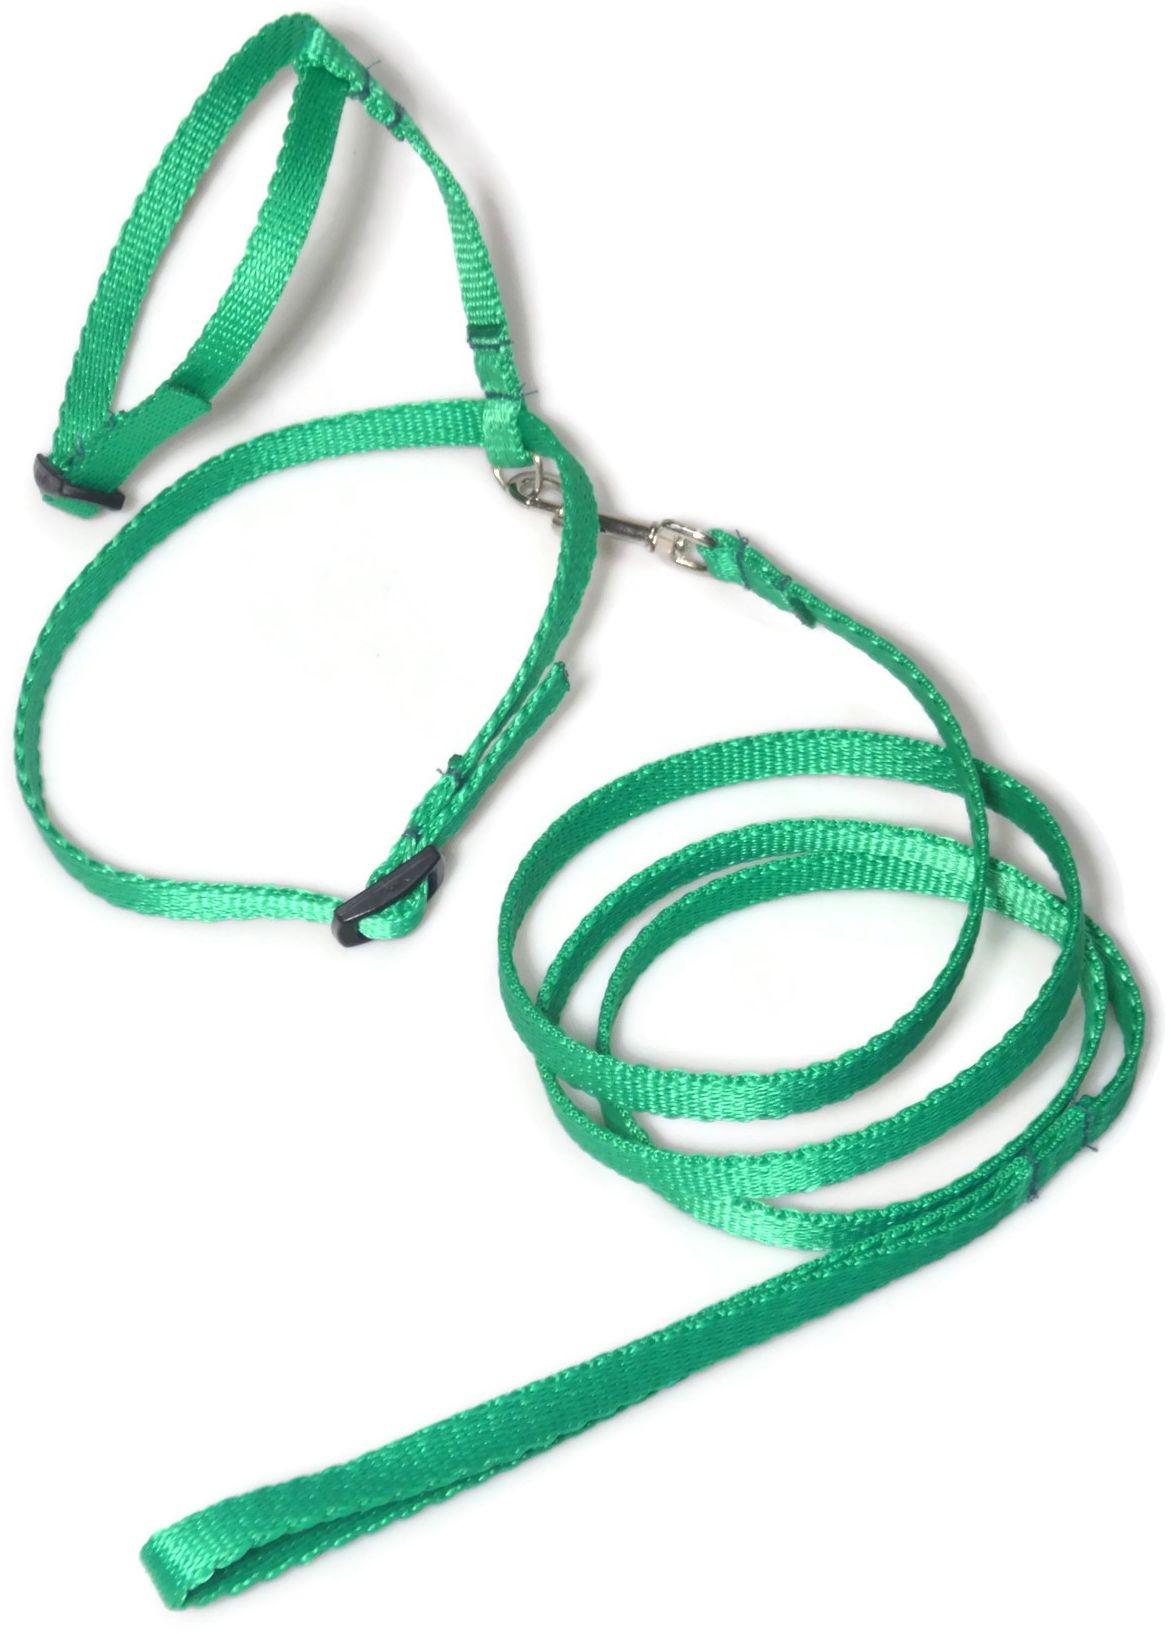 A-059 KOMPLET DLA KOTA V.2 : Kolor - Zielony - ALIZOO